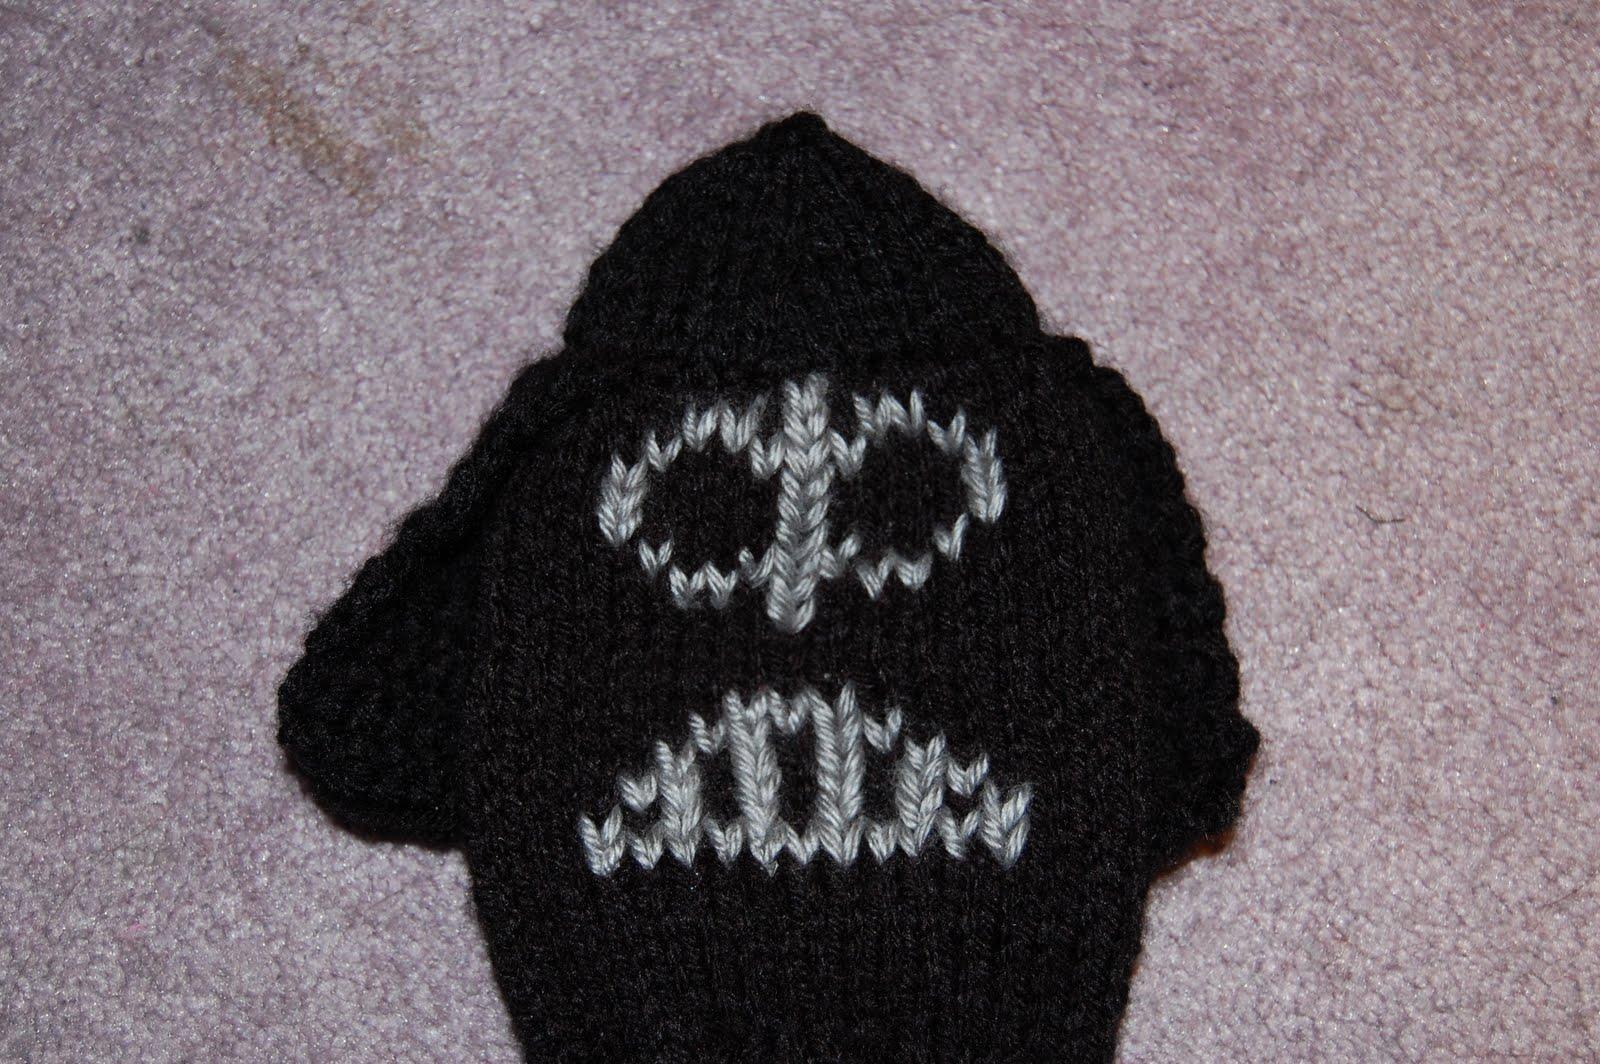 COVER CROCHET GOLF HEAD - Crochet — Learn How to Crochet